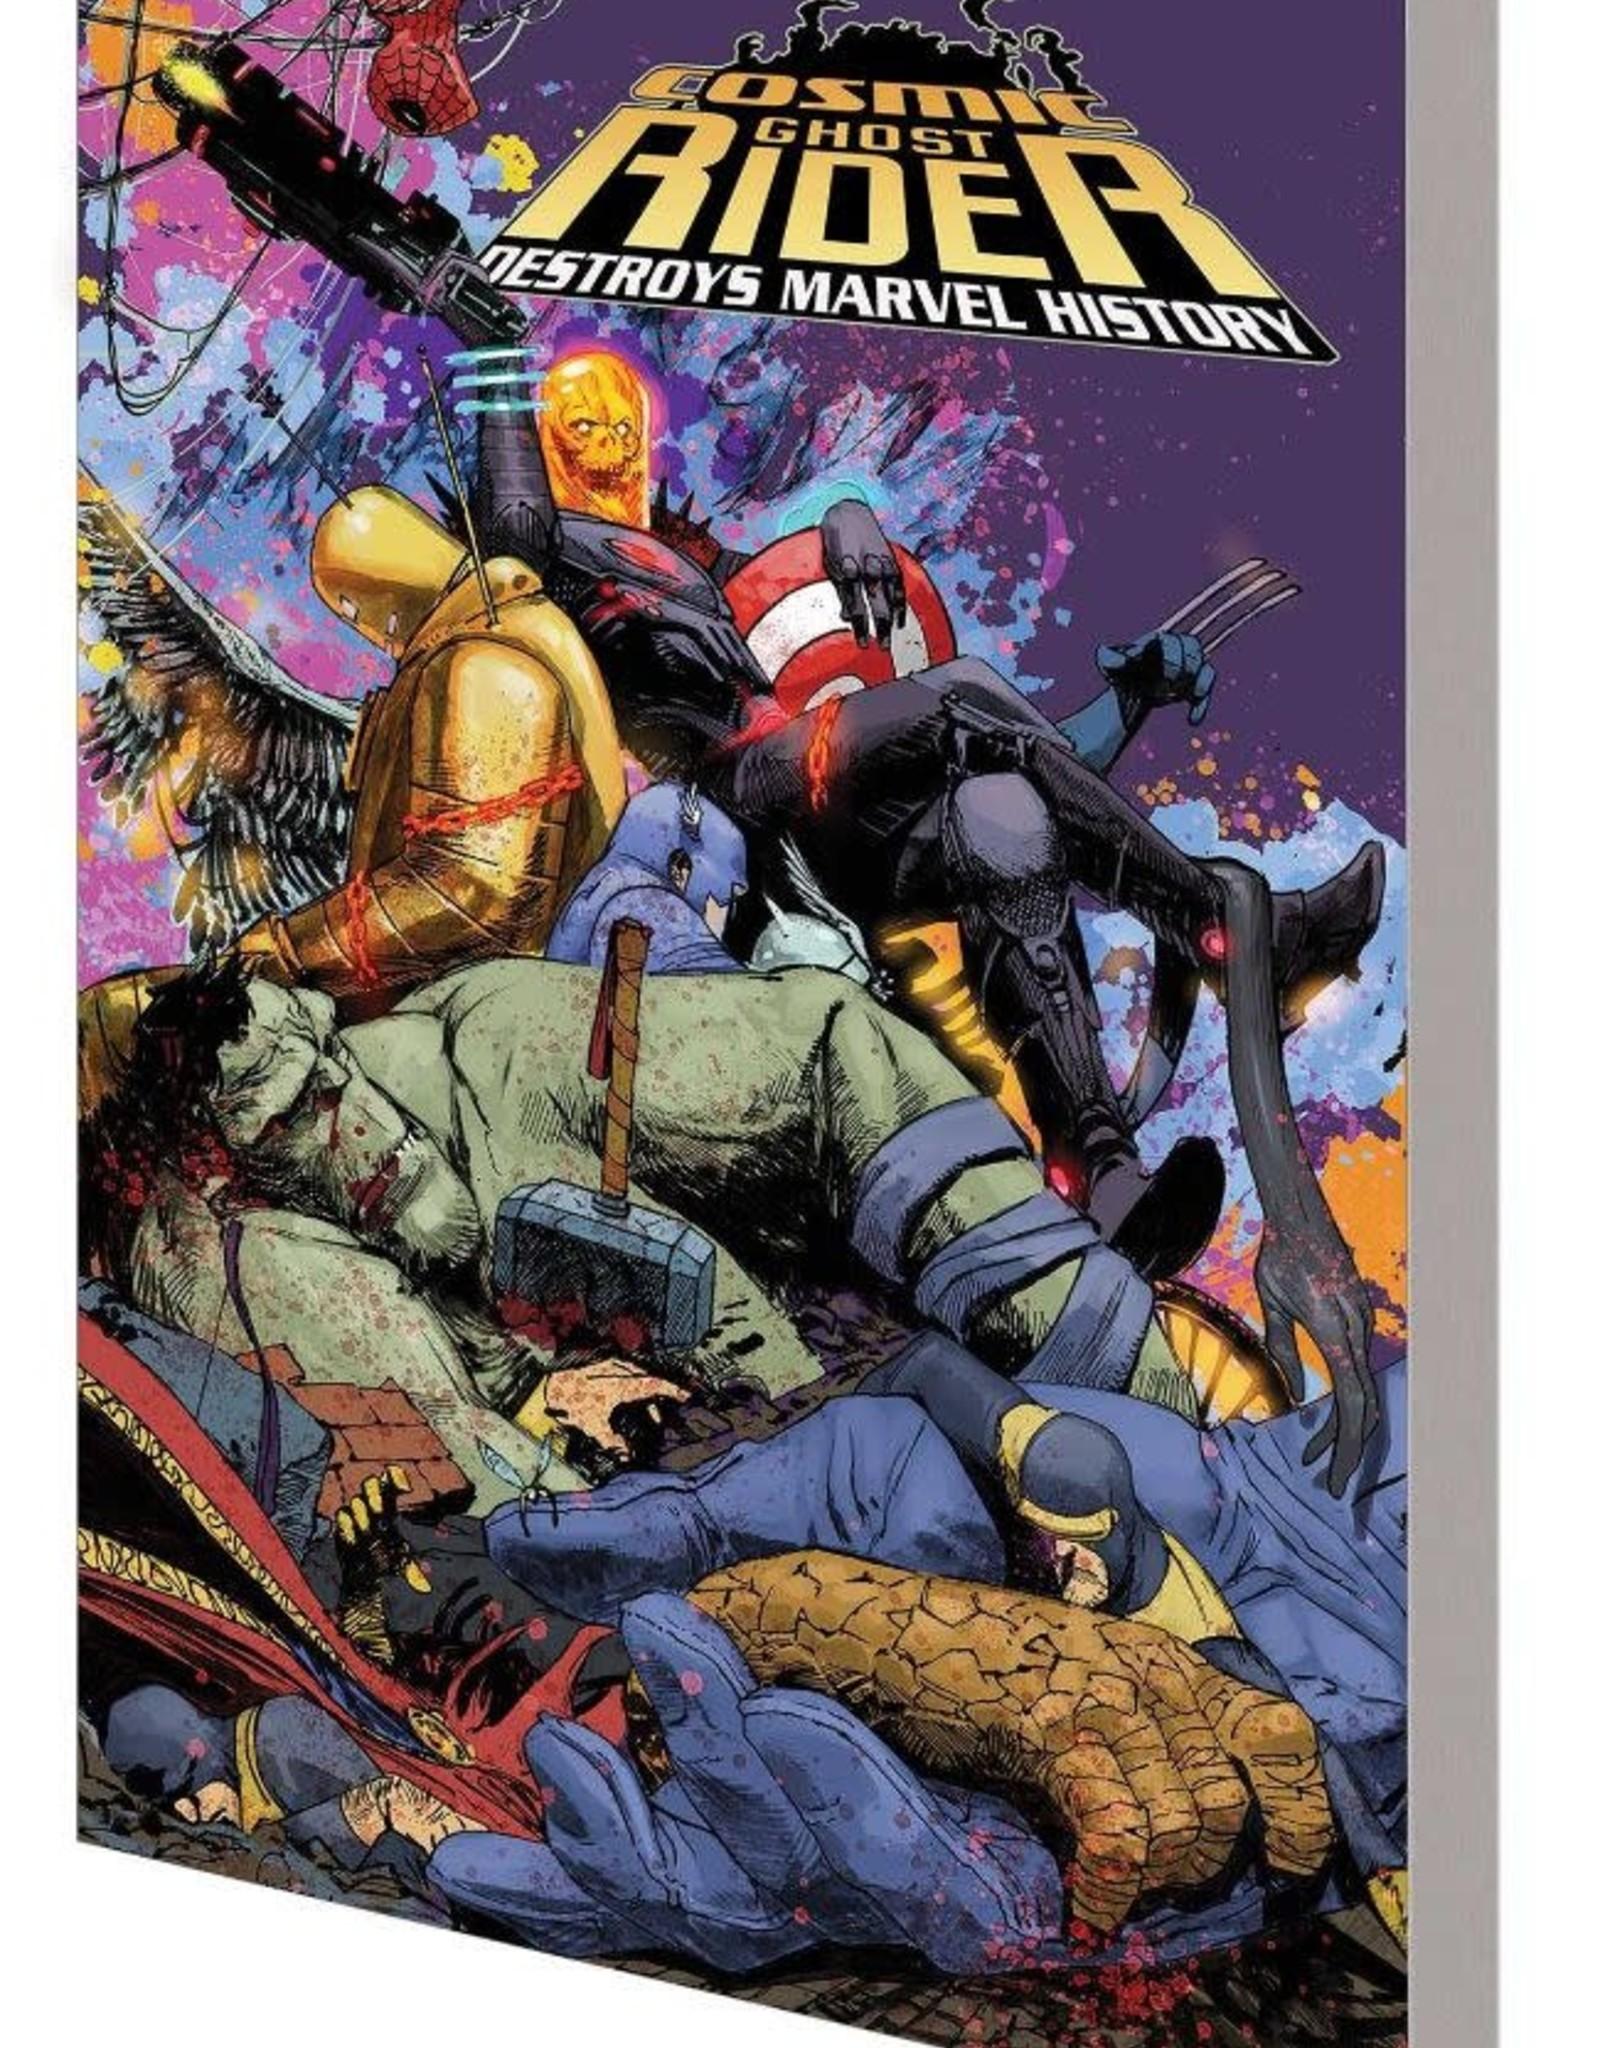 Marvel Comics Cosmic Ghost Rider Destroys Marvel History